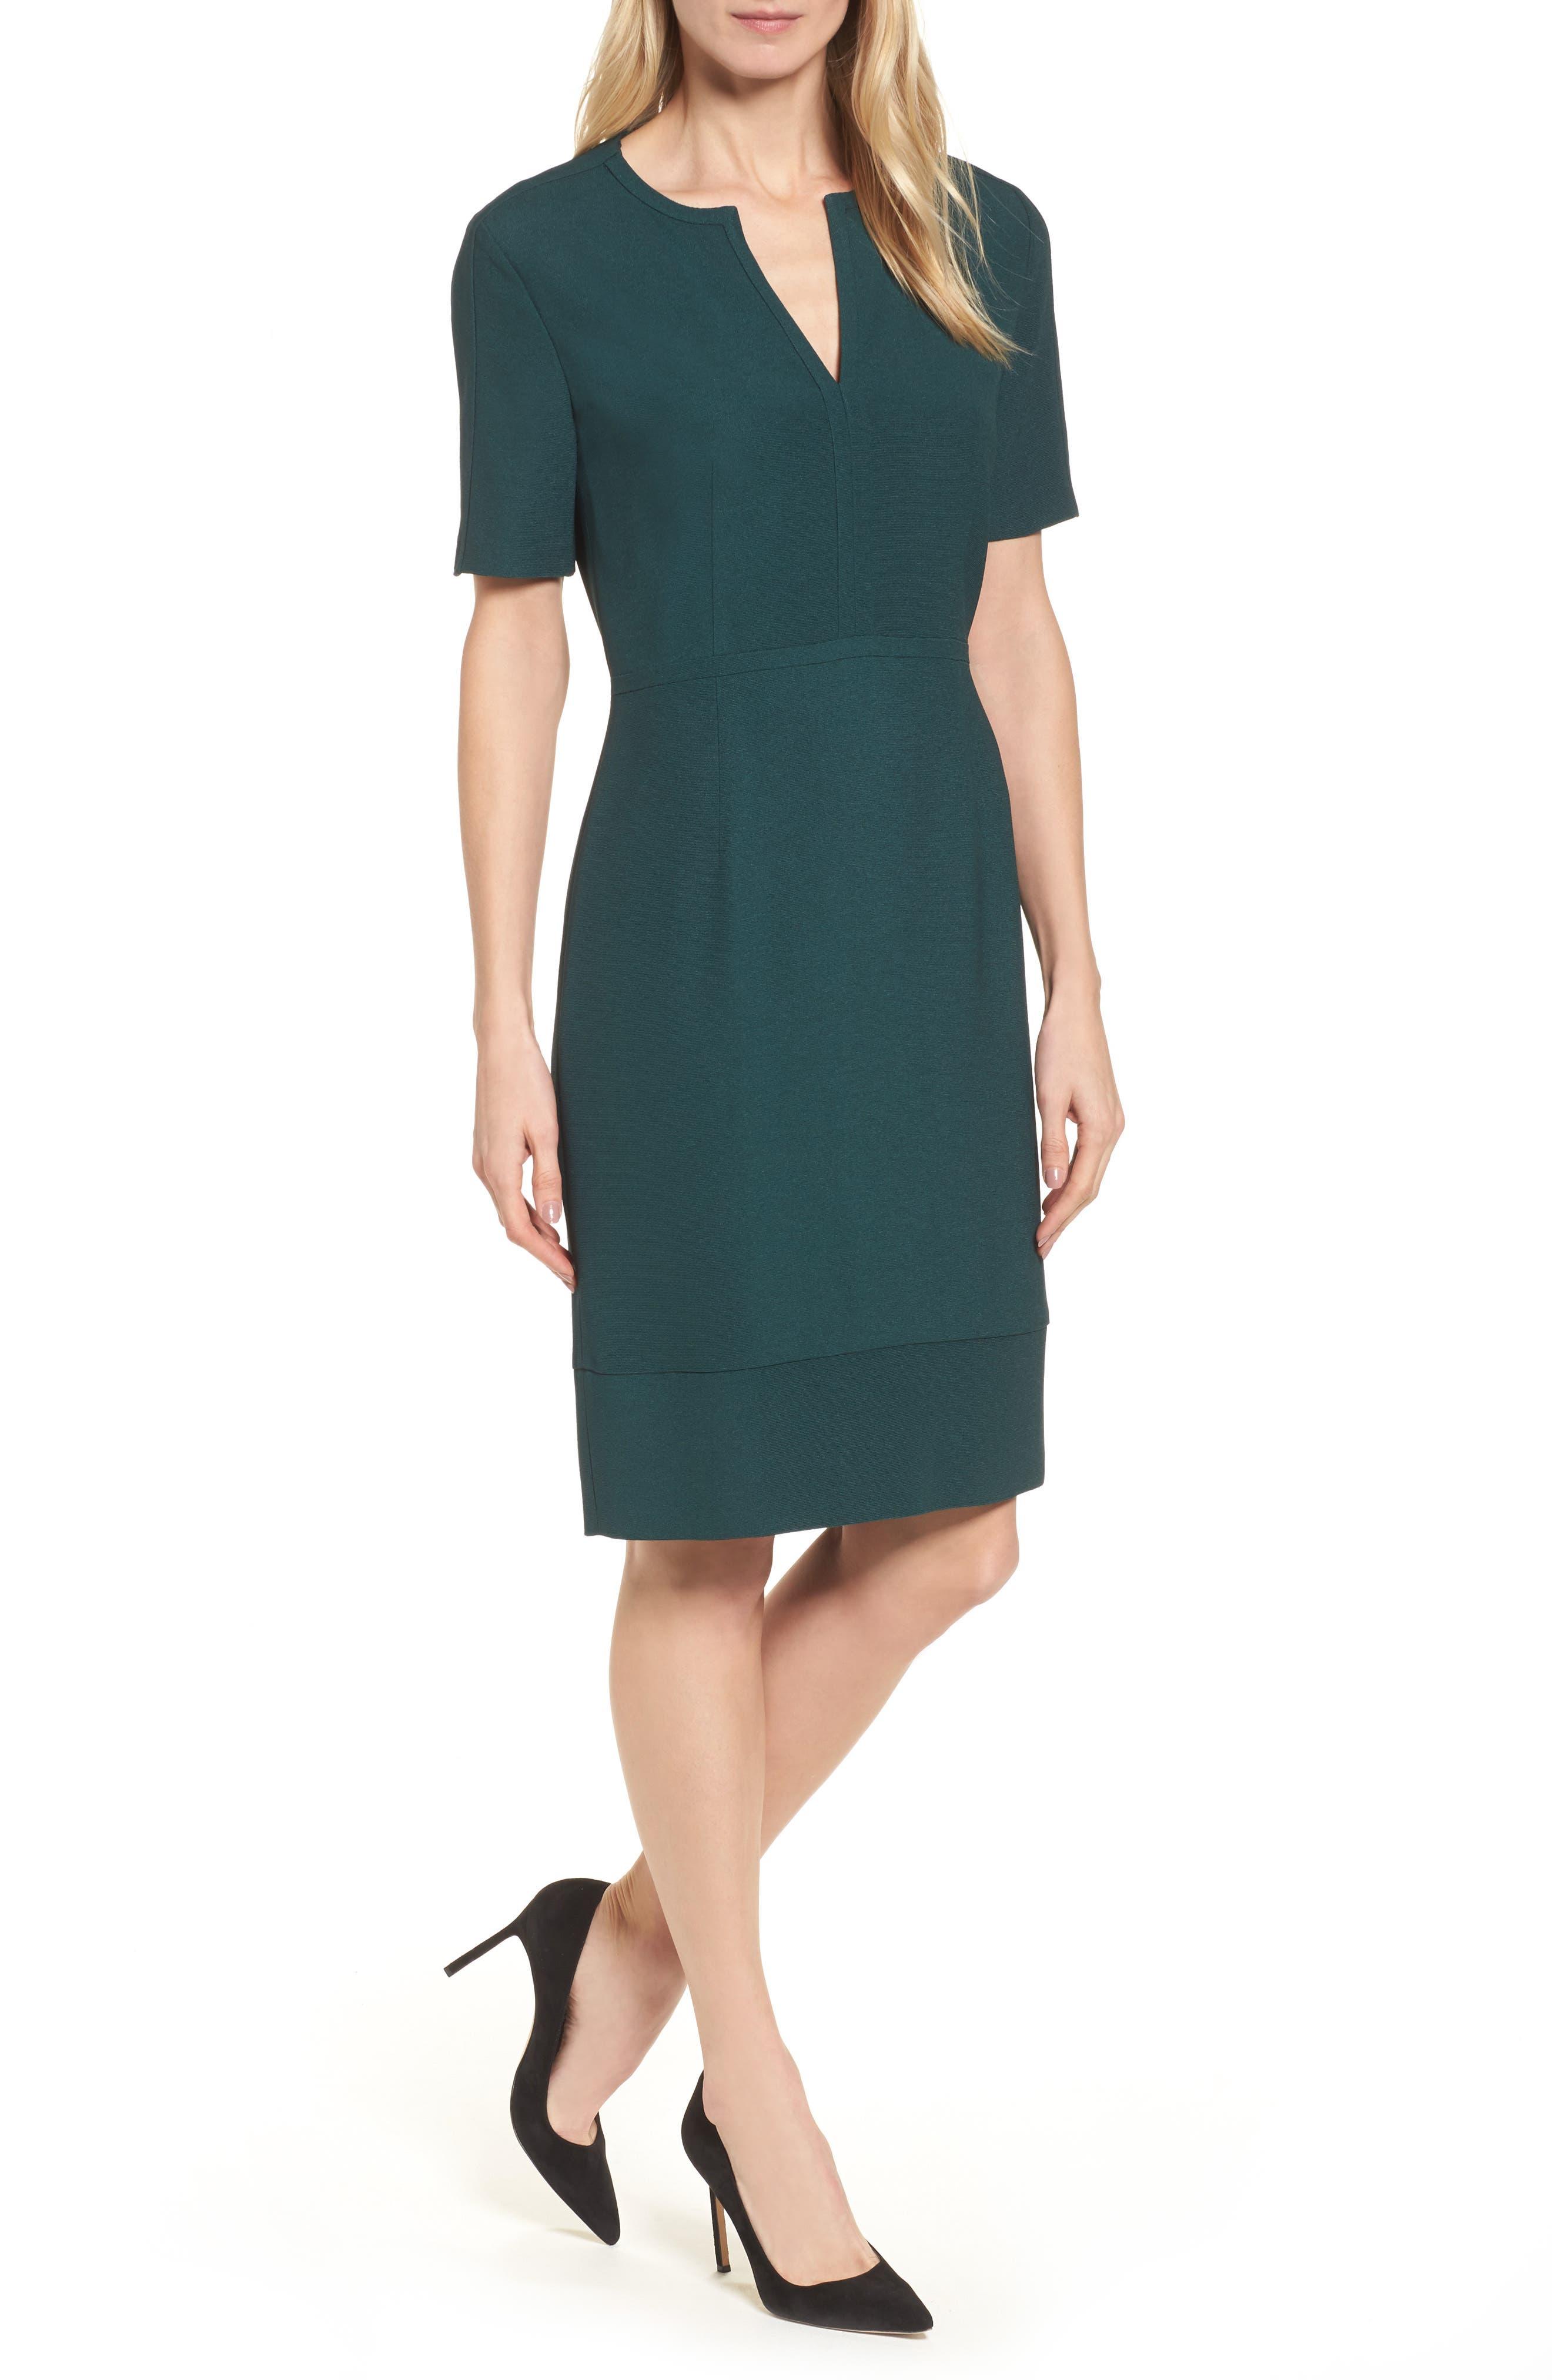 Dalesana Sheath Dress,                         Main,                         color, 301